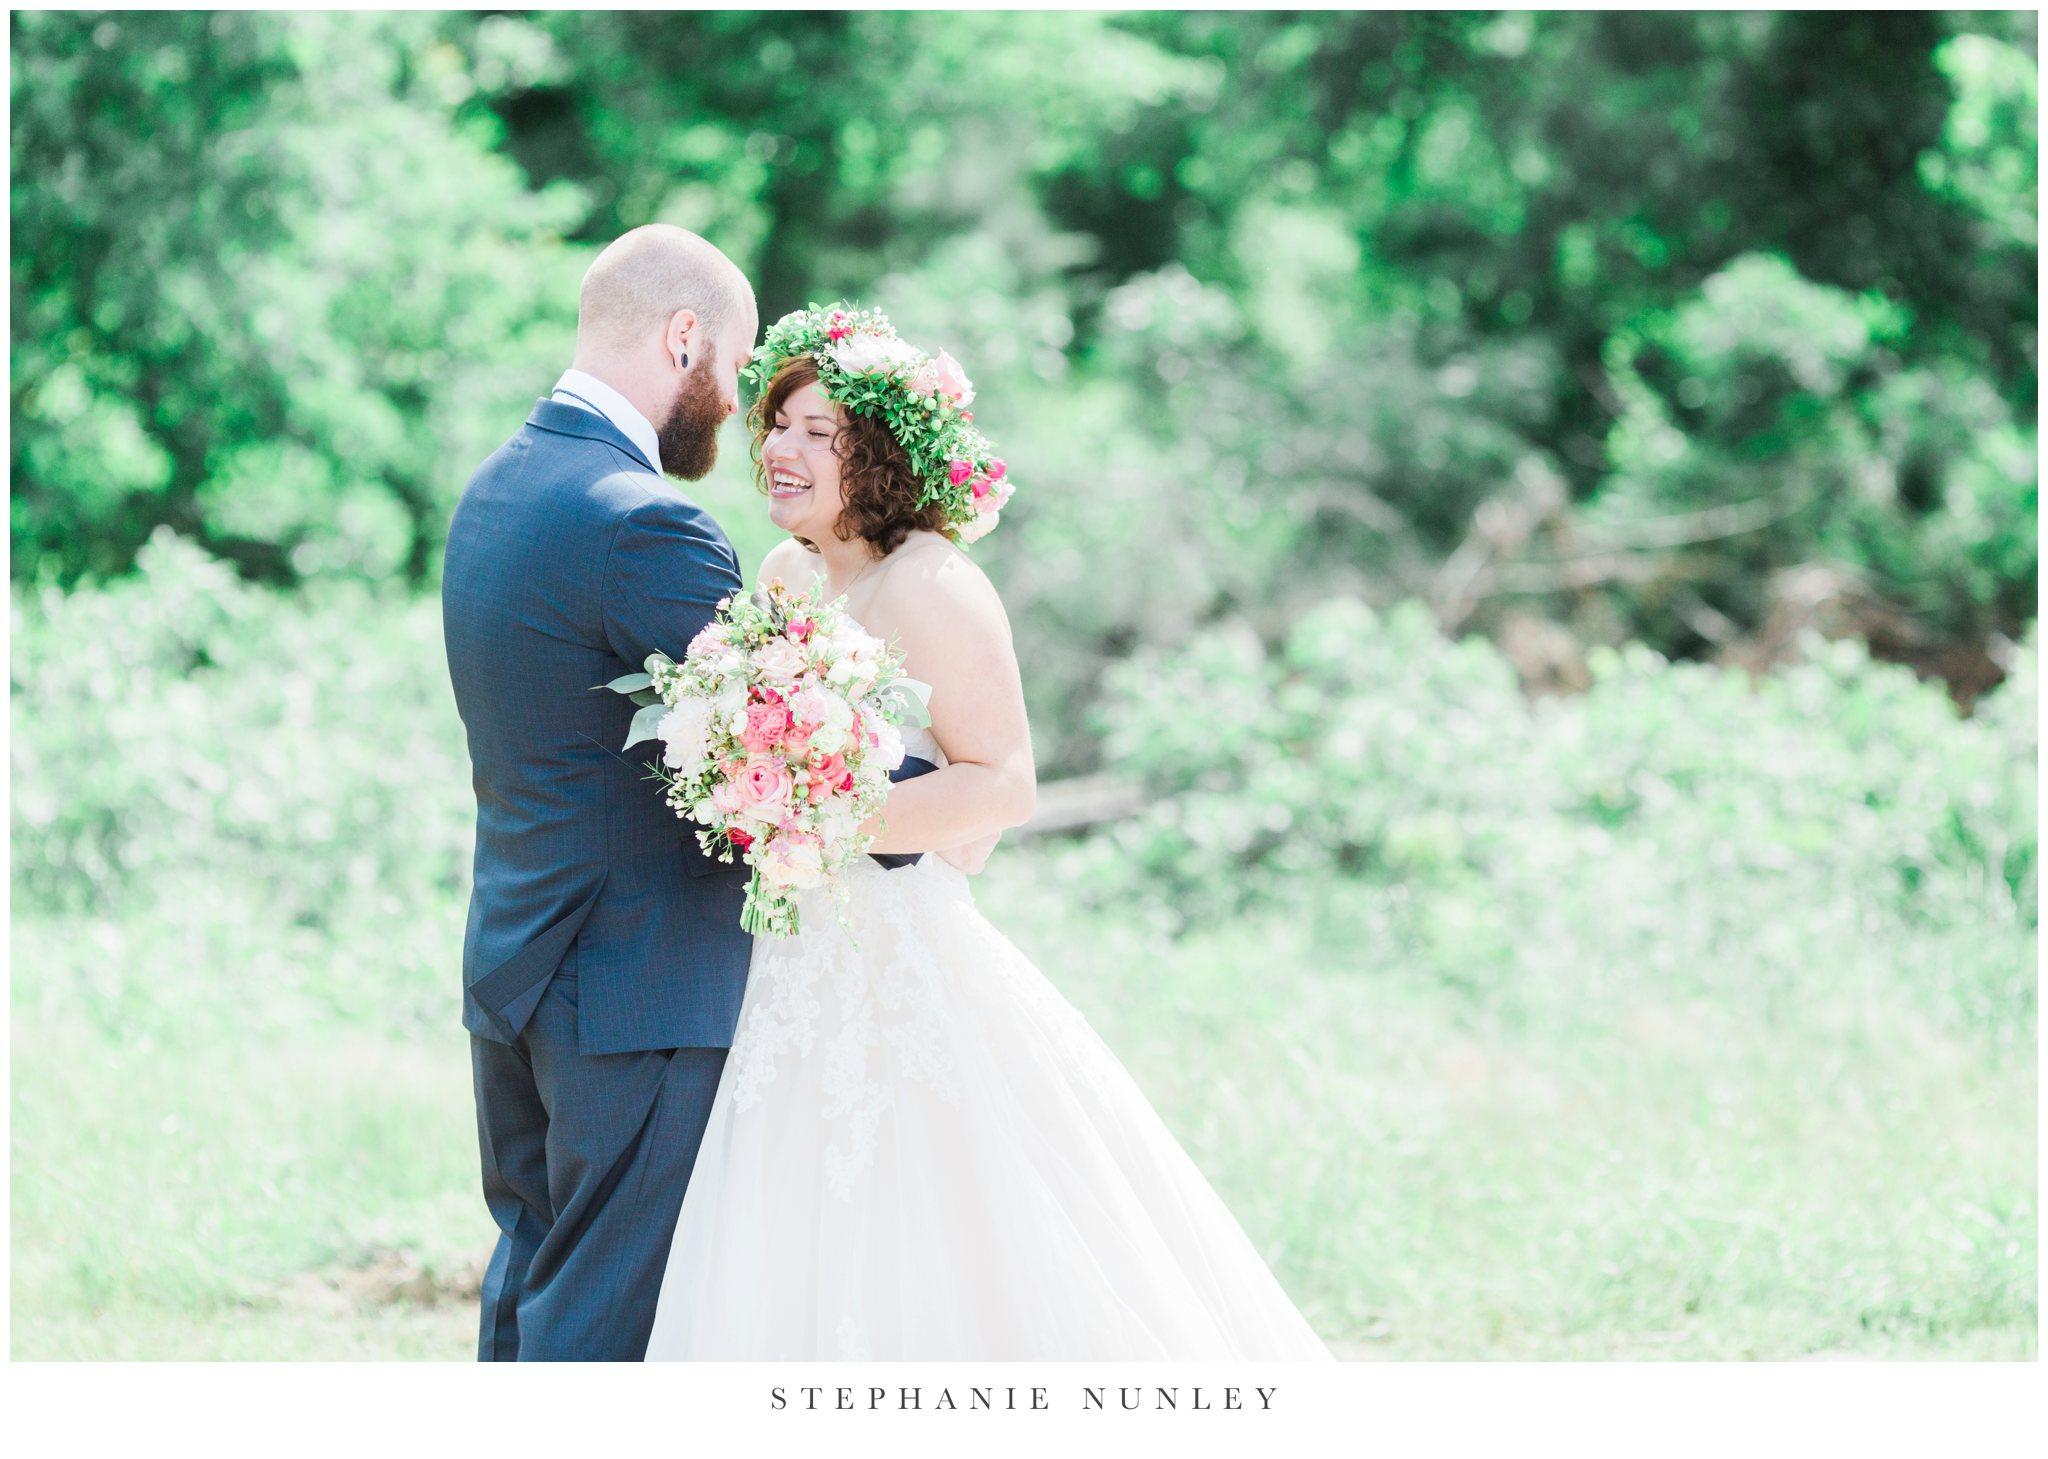 romantic-outdoor-wedding-with-flower-crown-0039.jpg